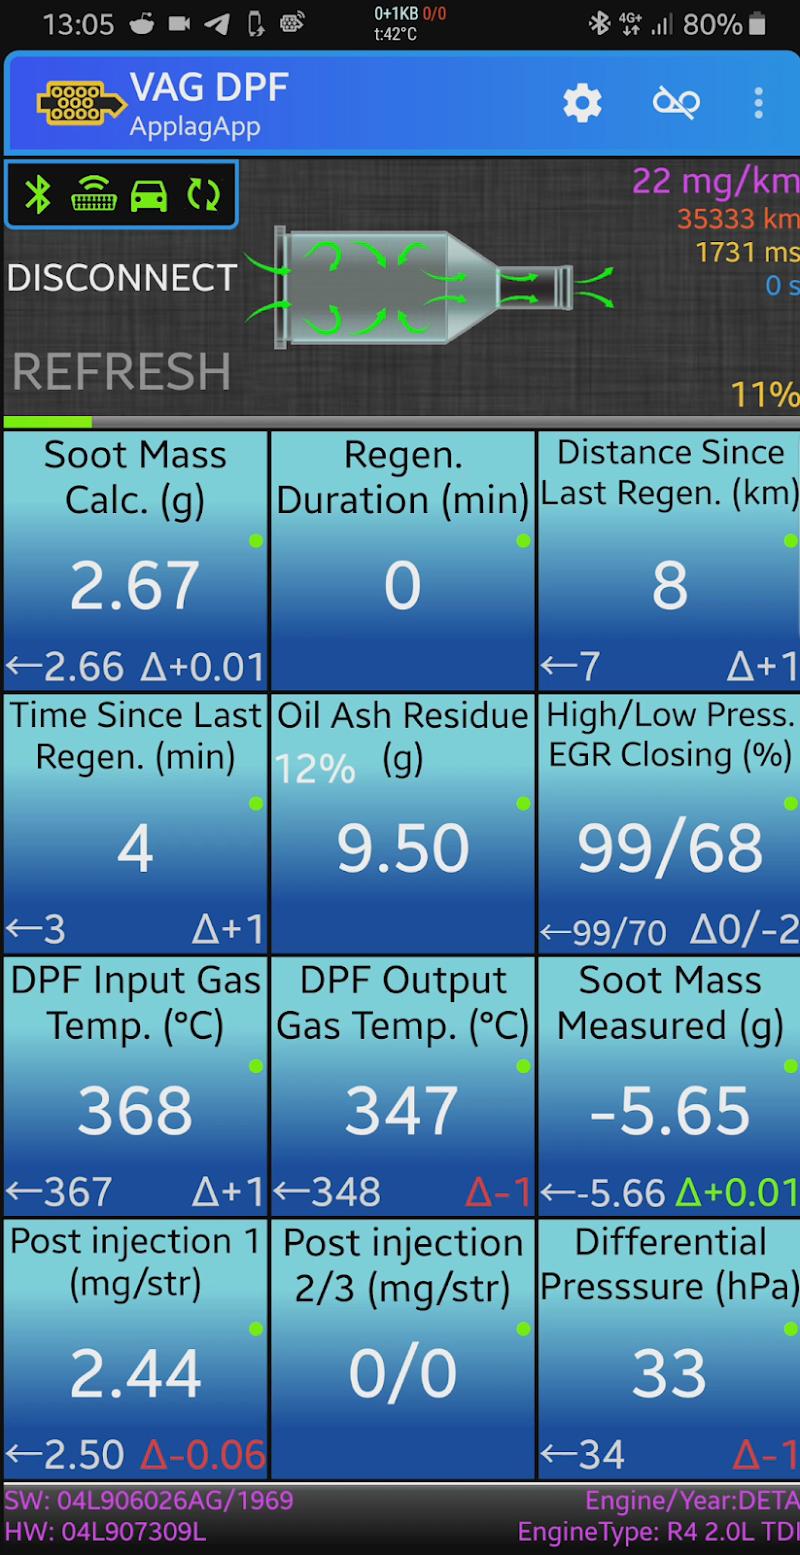 VAG DPF Screenshot 3